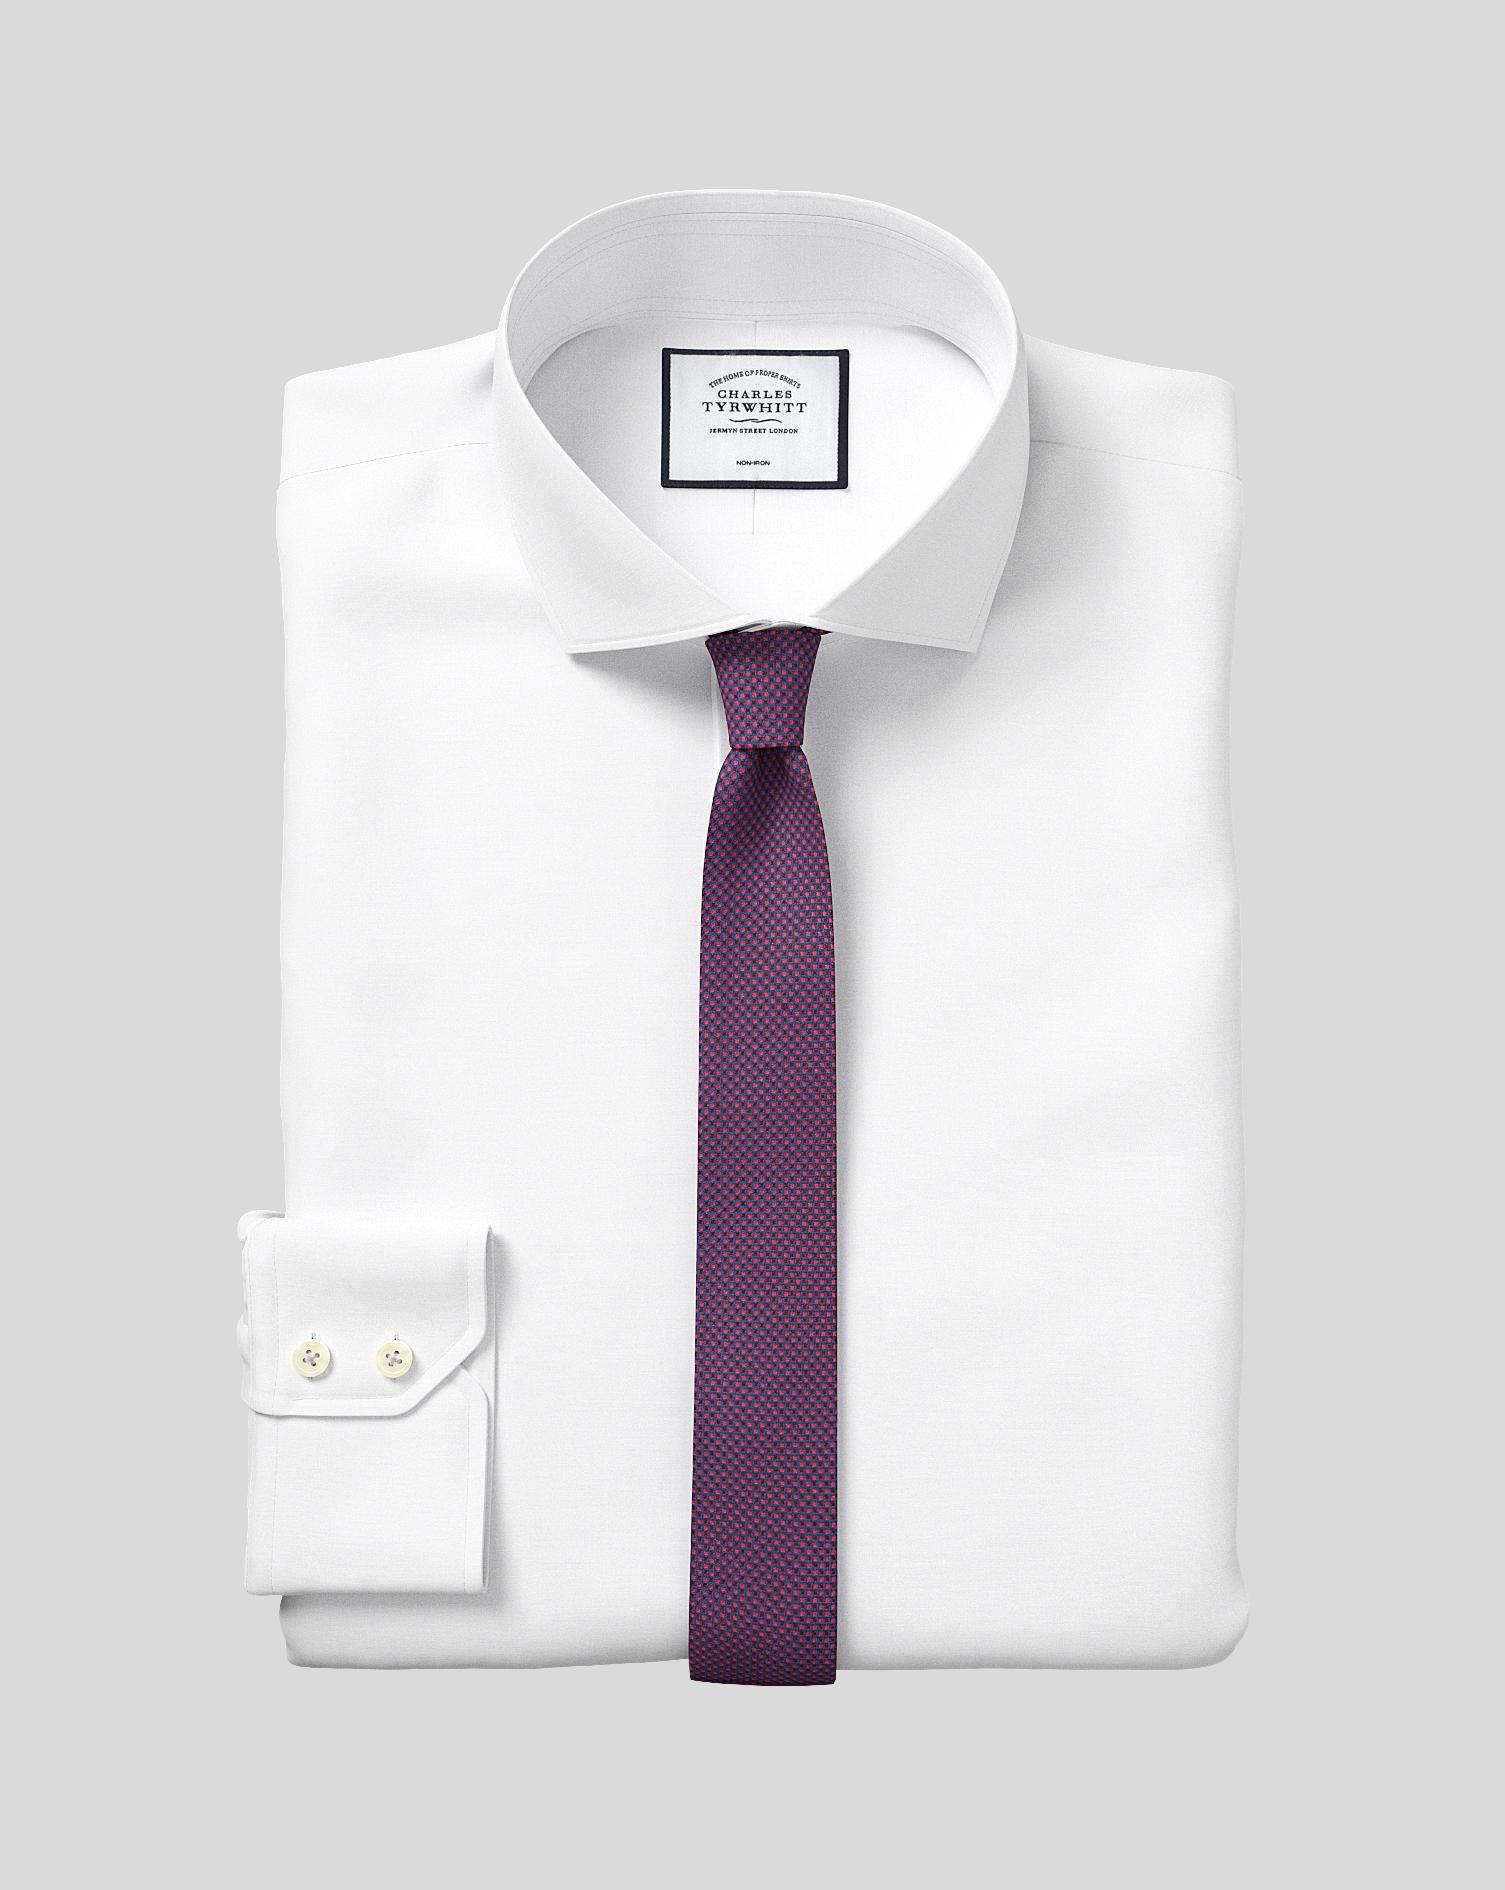 Cotton Slim Fit Non-Iron 4-Way Stretch White Shirt